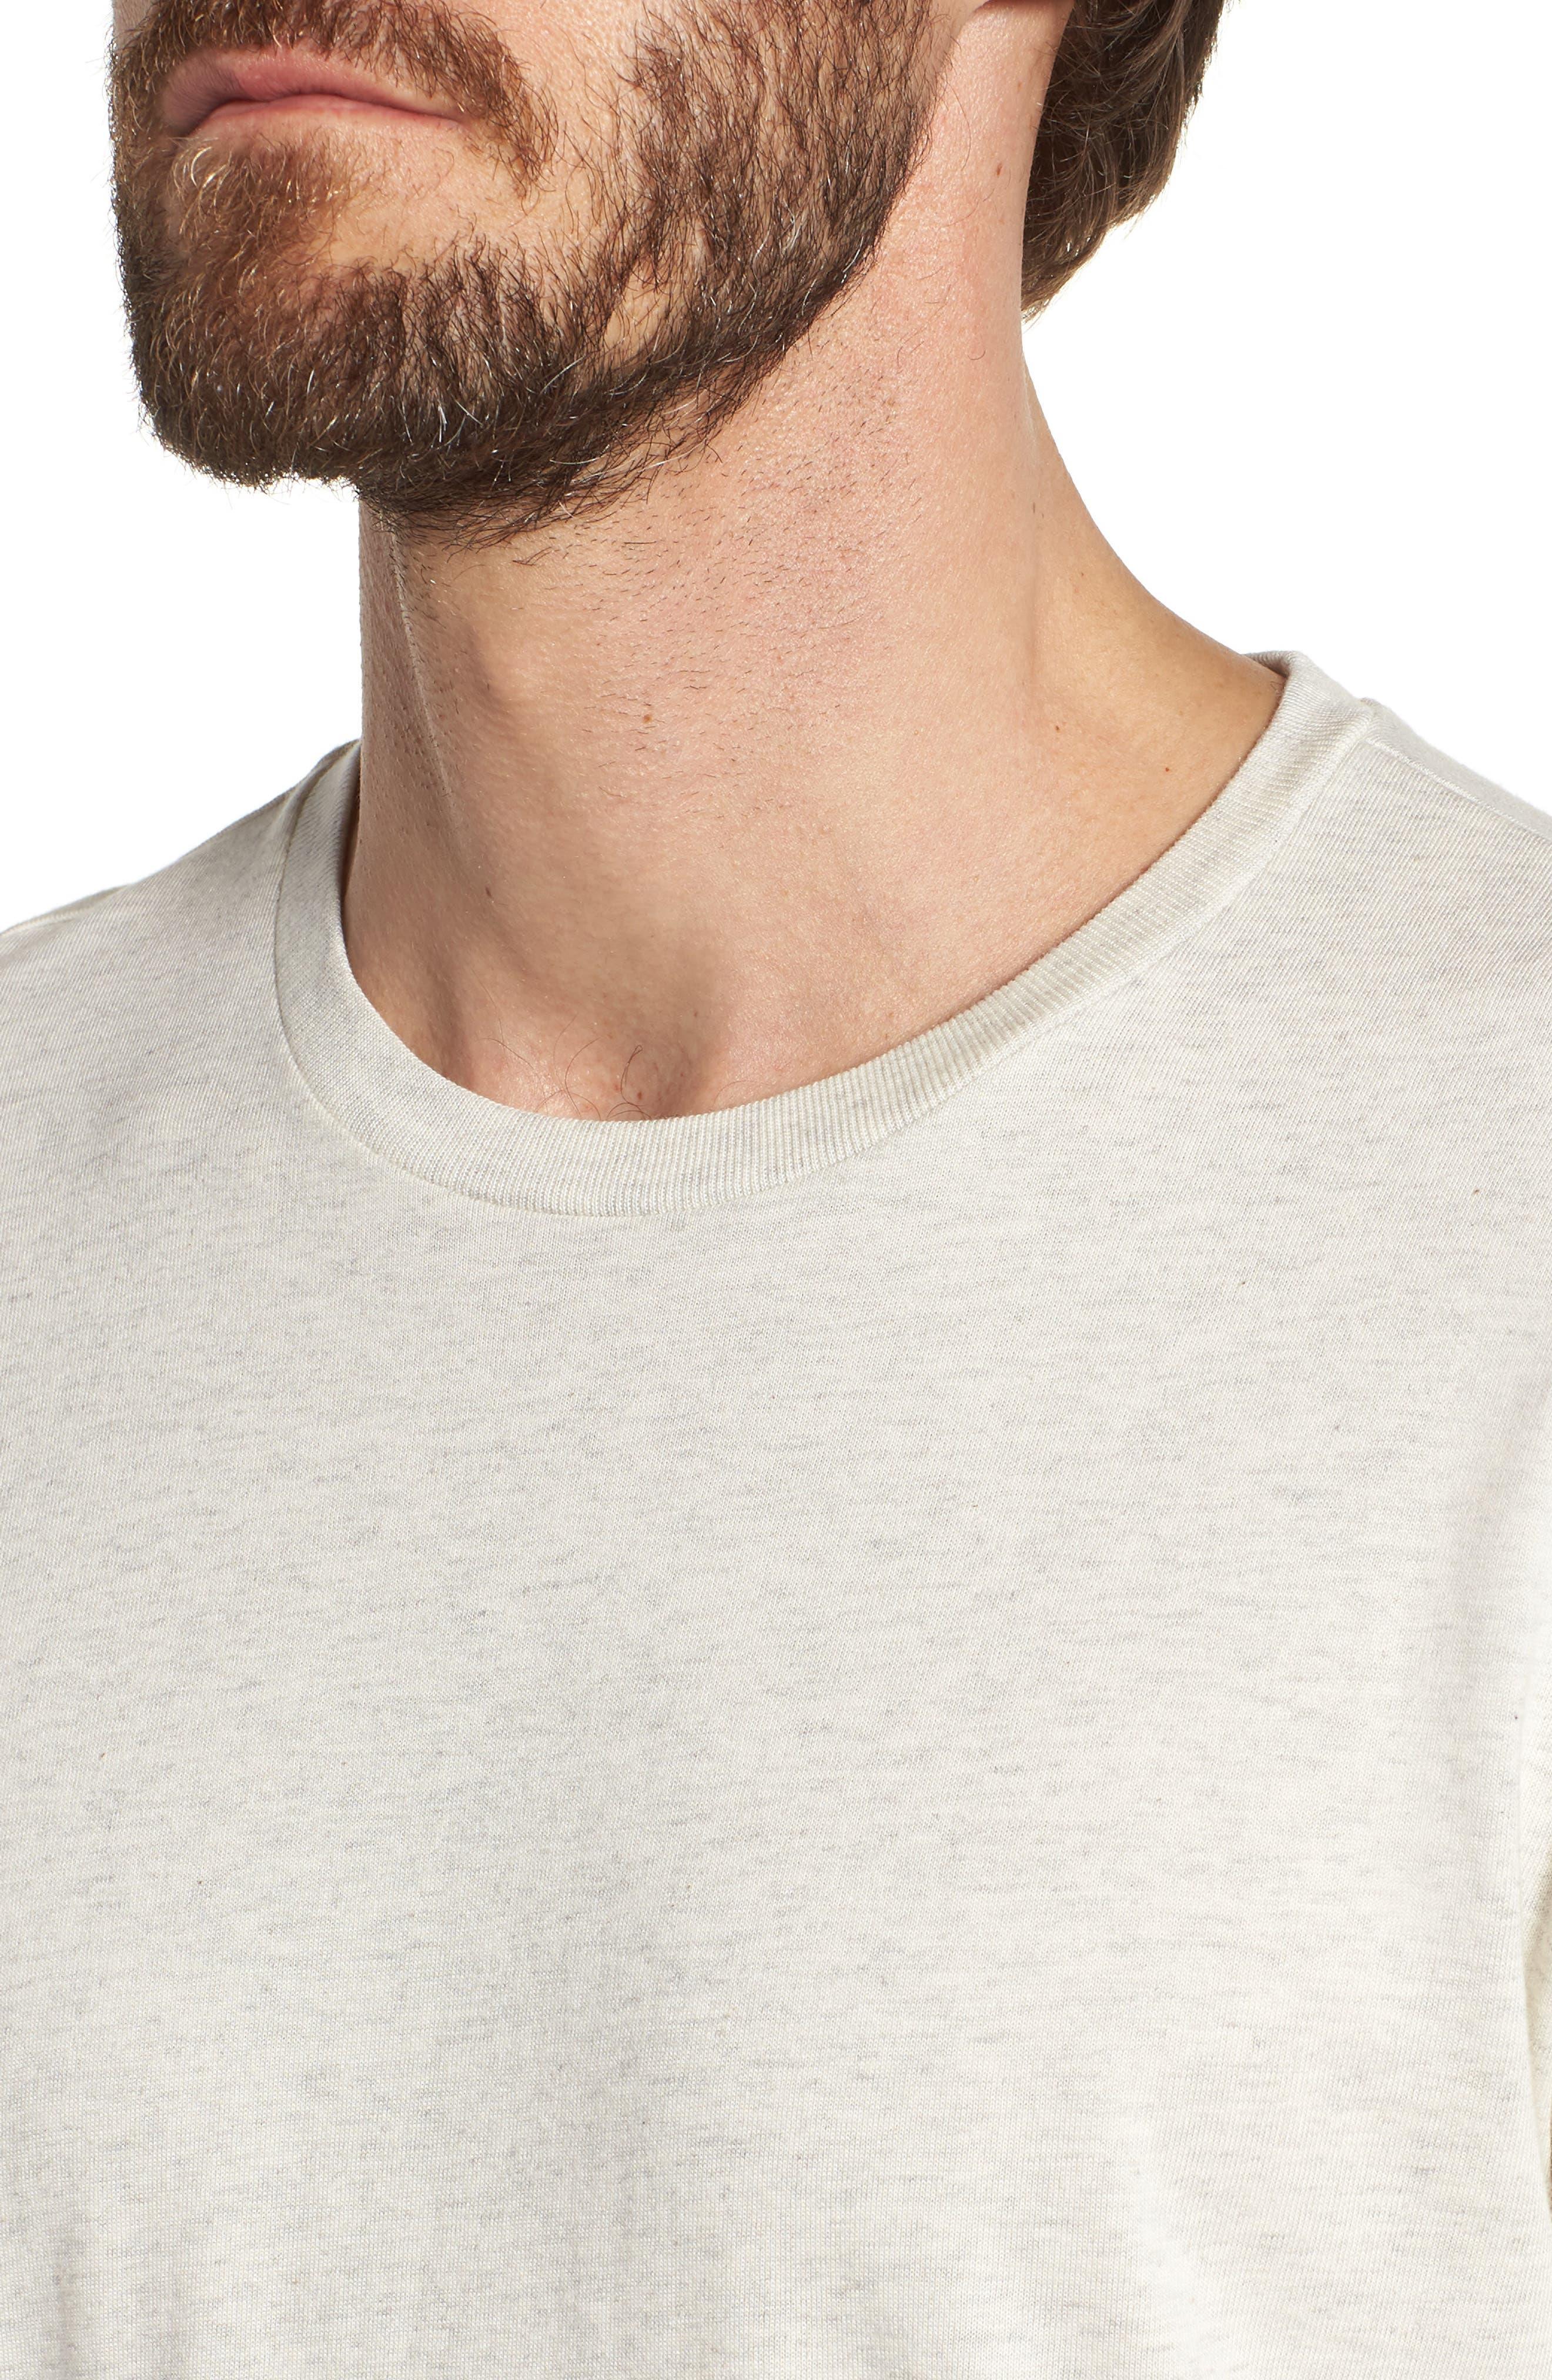 Supreme Comfort Crewneck T-Shirt,                             Alternate thumbnail 4, color,                             026